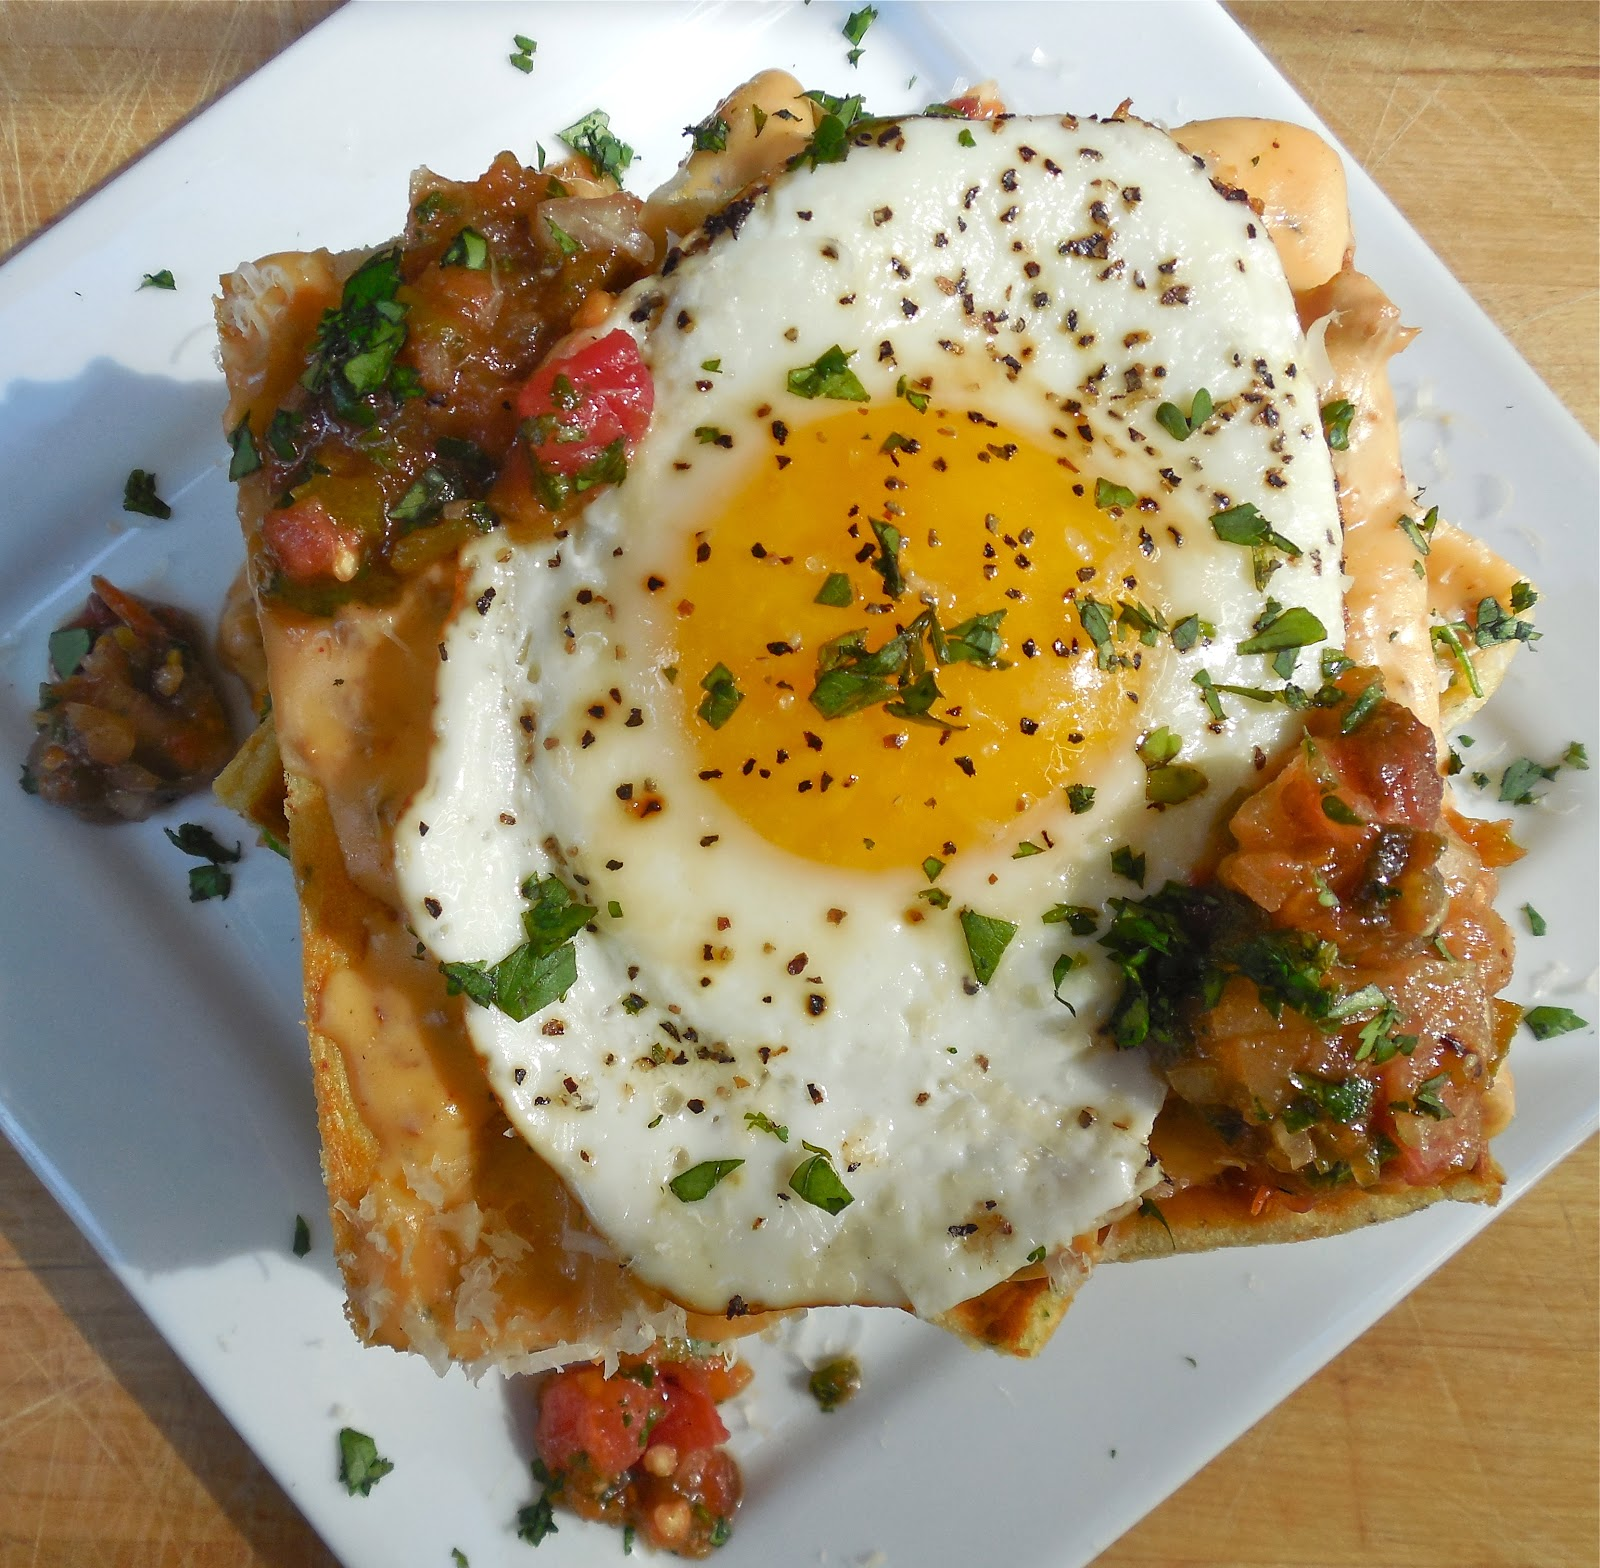 ... Cornmeal Waffles with Chorizo Gravy, Blackened Heirloom Tomato Salsa